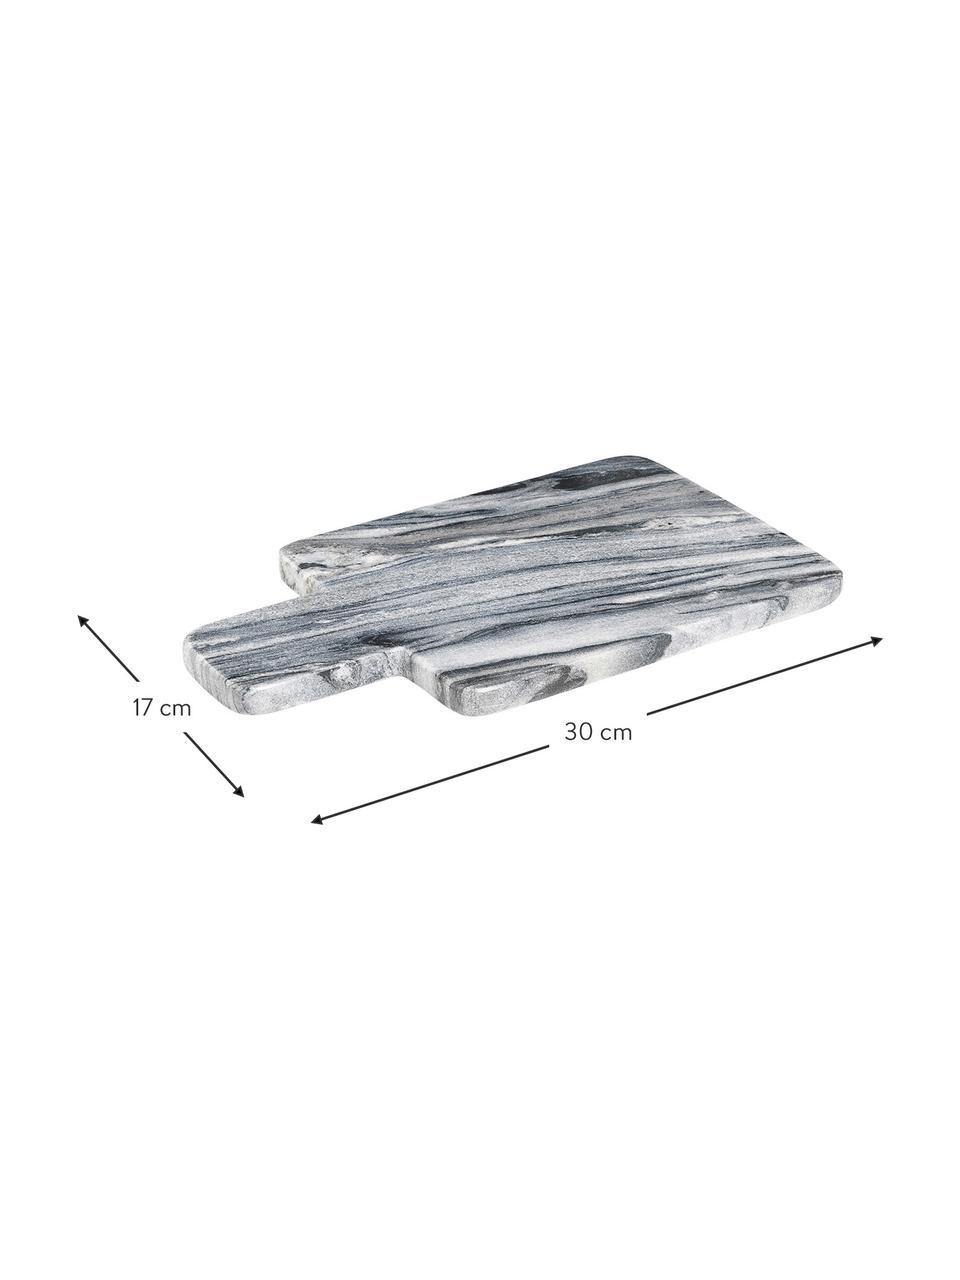 Marmor-Schneidebrett Adam, L 30 x B 17 cm, Marmor, Grau, 17 x 30 cm